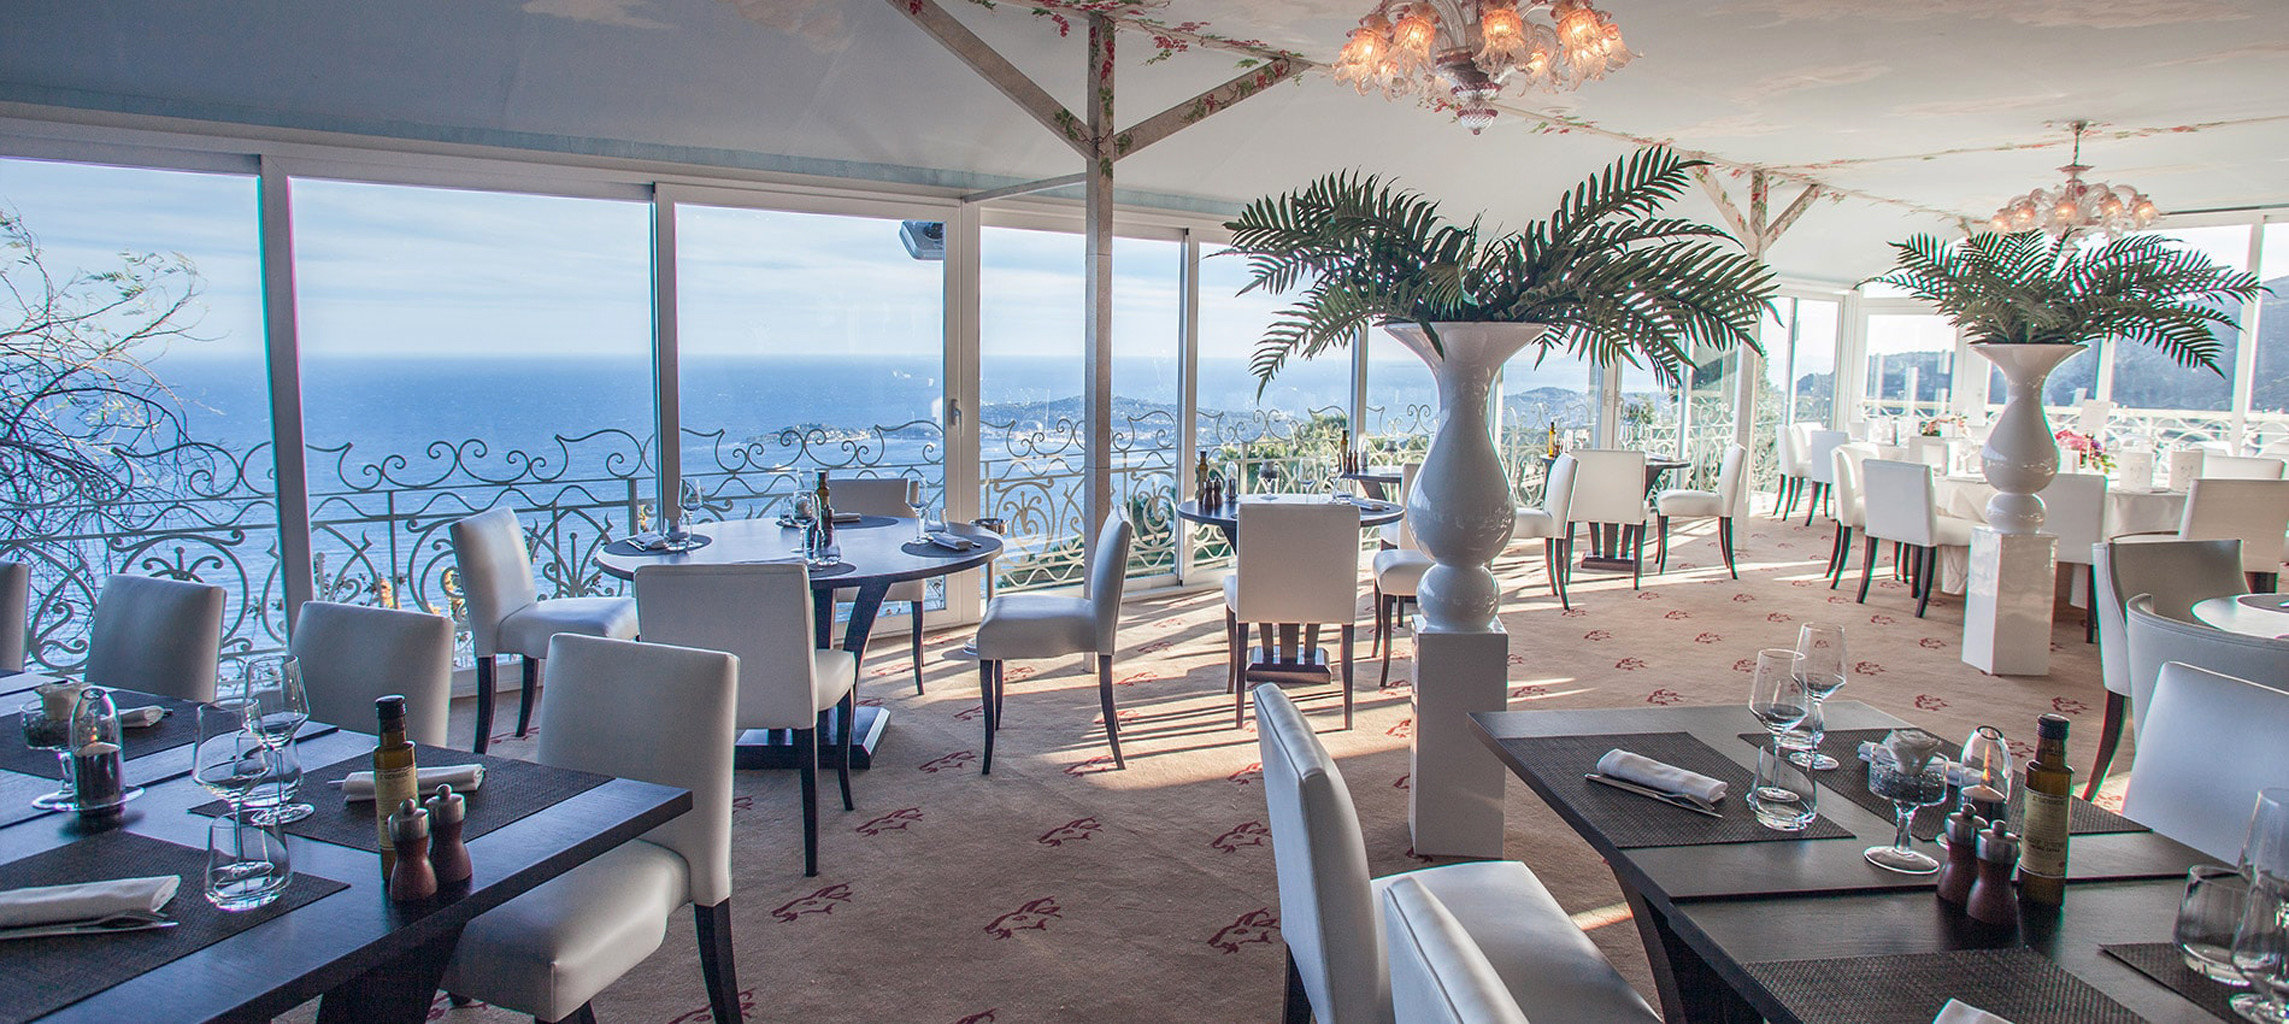 property chair restaurant Resort home Villa condominium